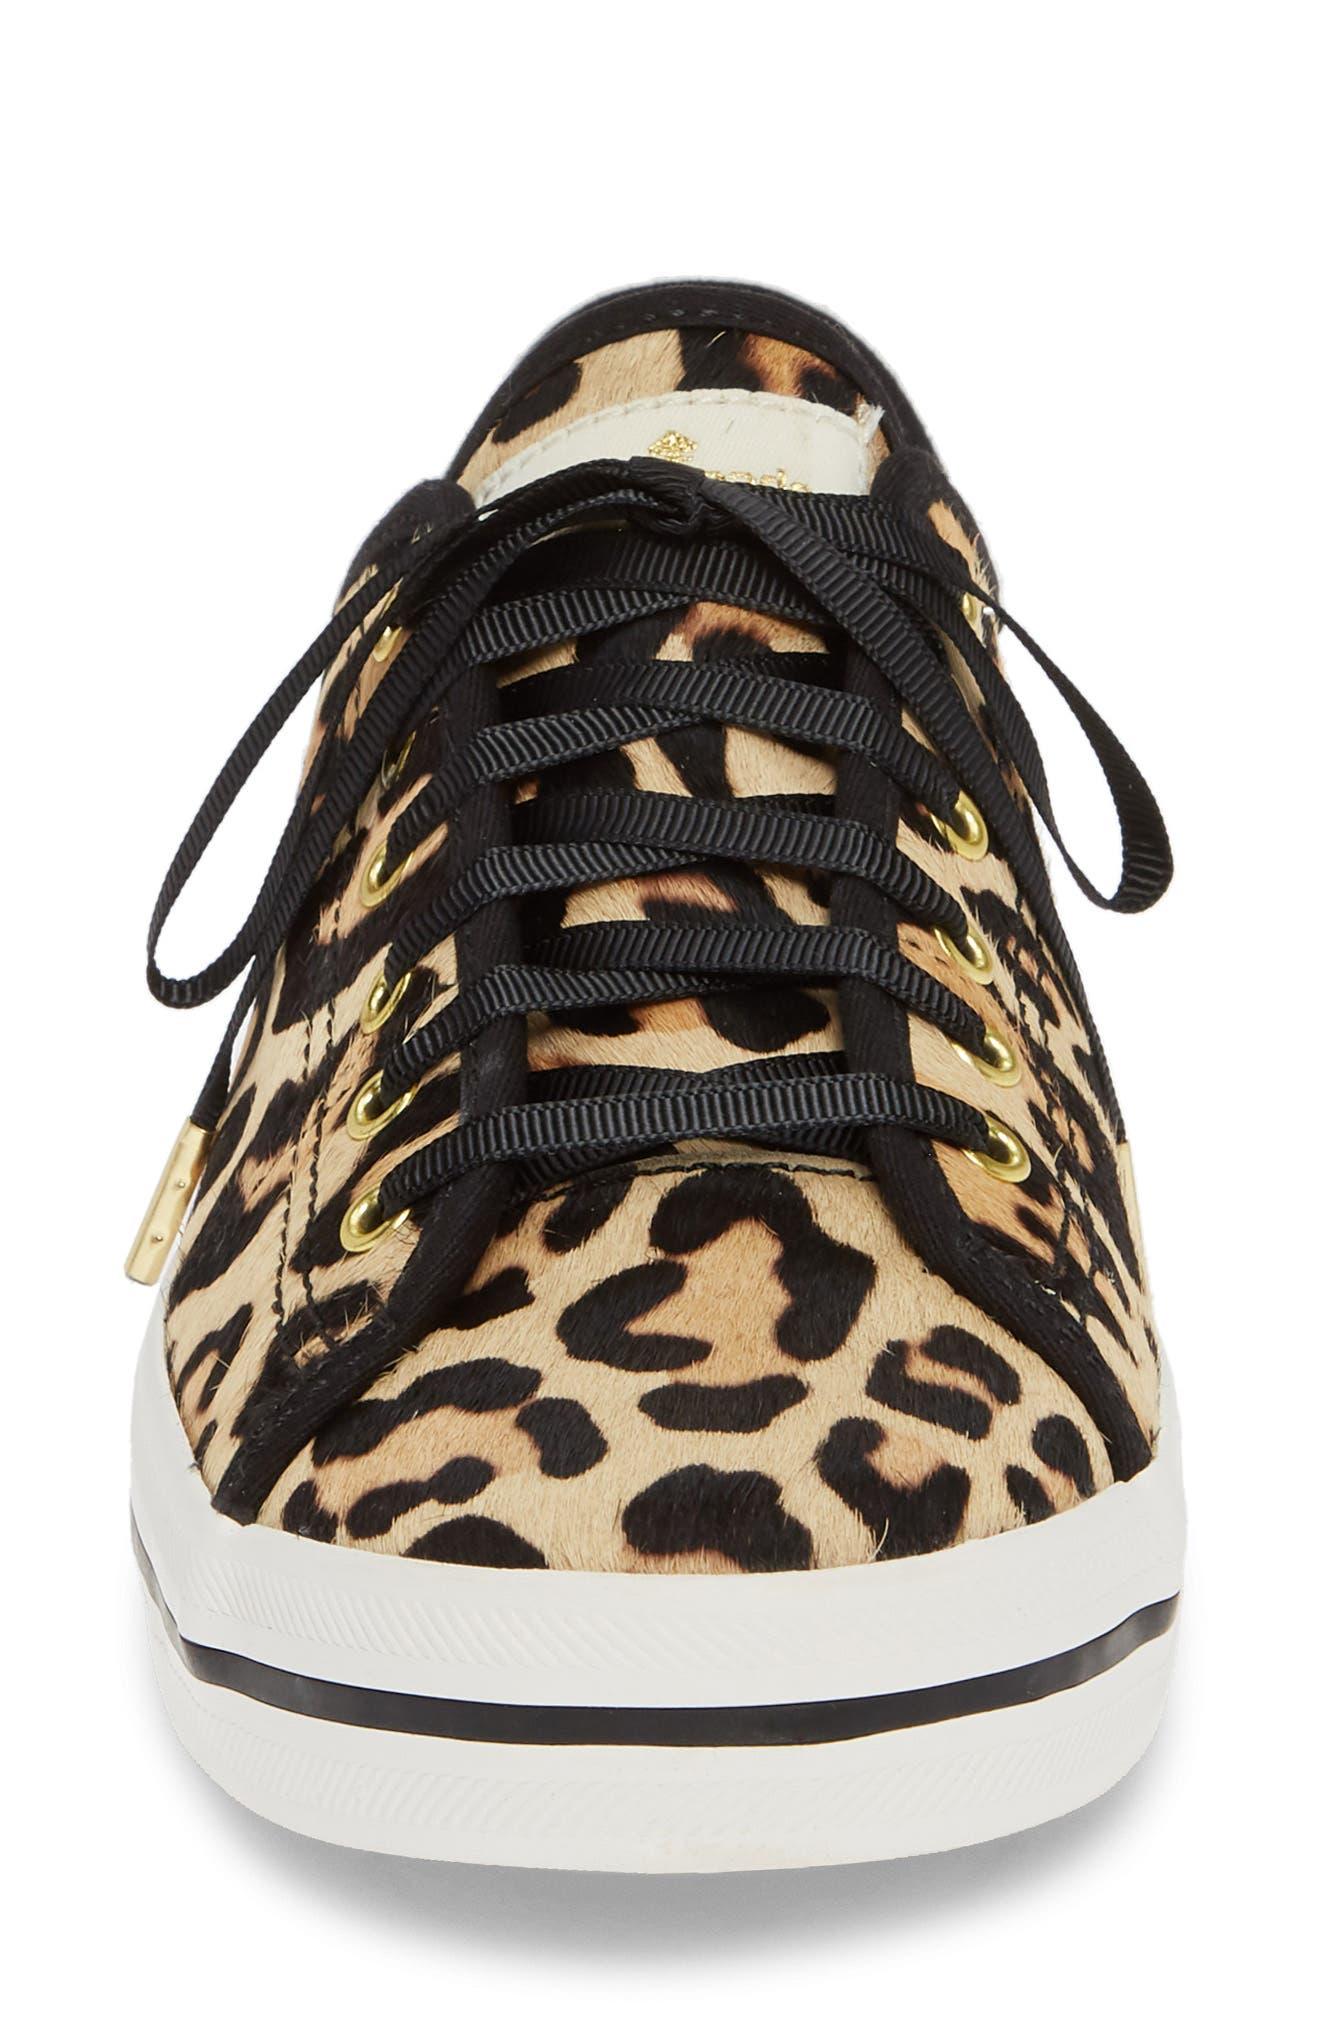 KEDS<SUP>®</SUP> FOR KATE SPADE NEW YORK, kickstart genuine calf hair sneaker, Alternate thumbnail 4, color, TAN LEOPARD CALF HAIR